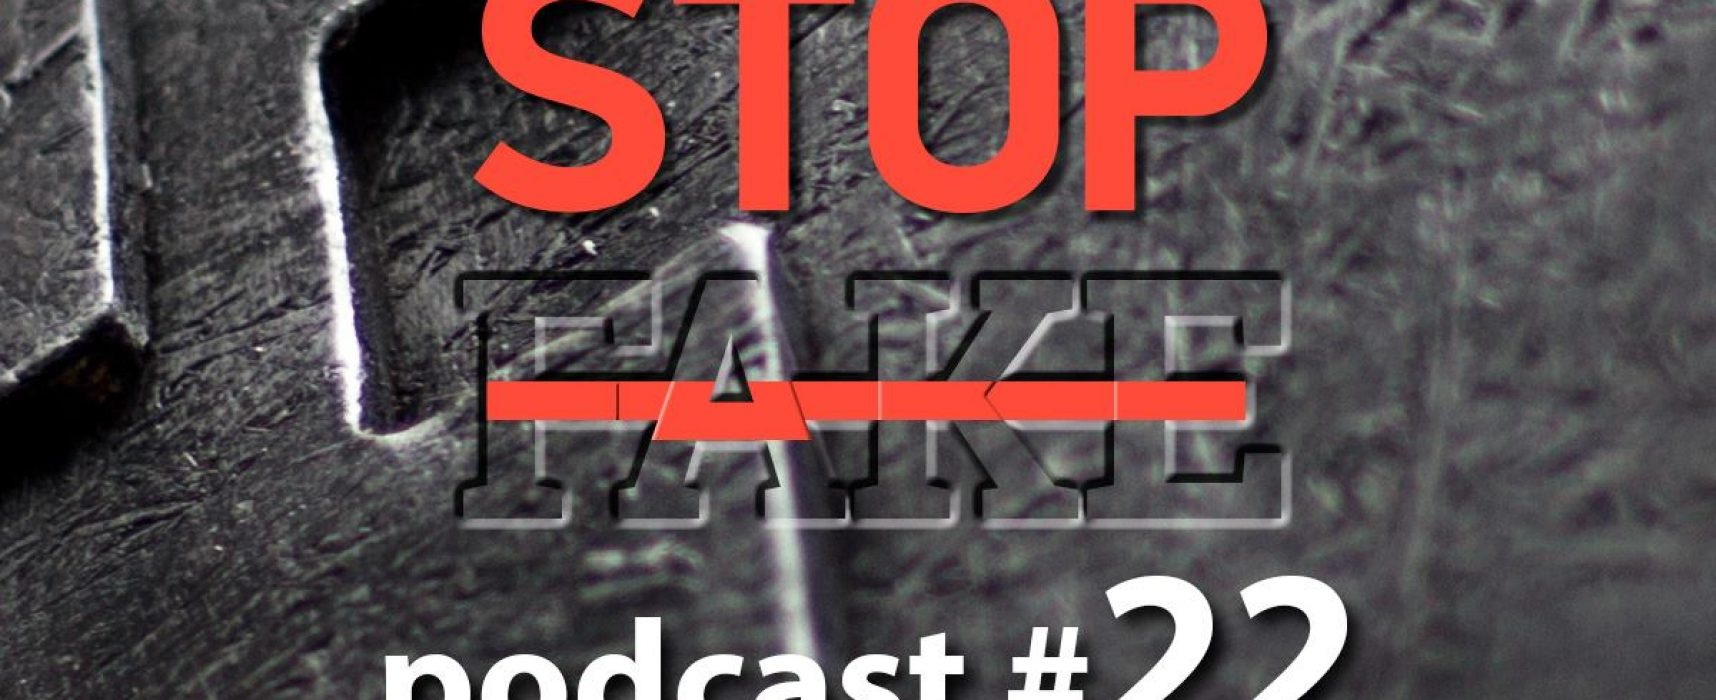 StopFake podcast #22